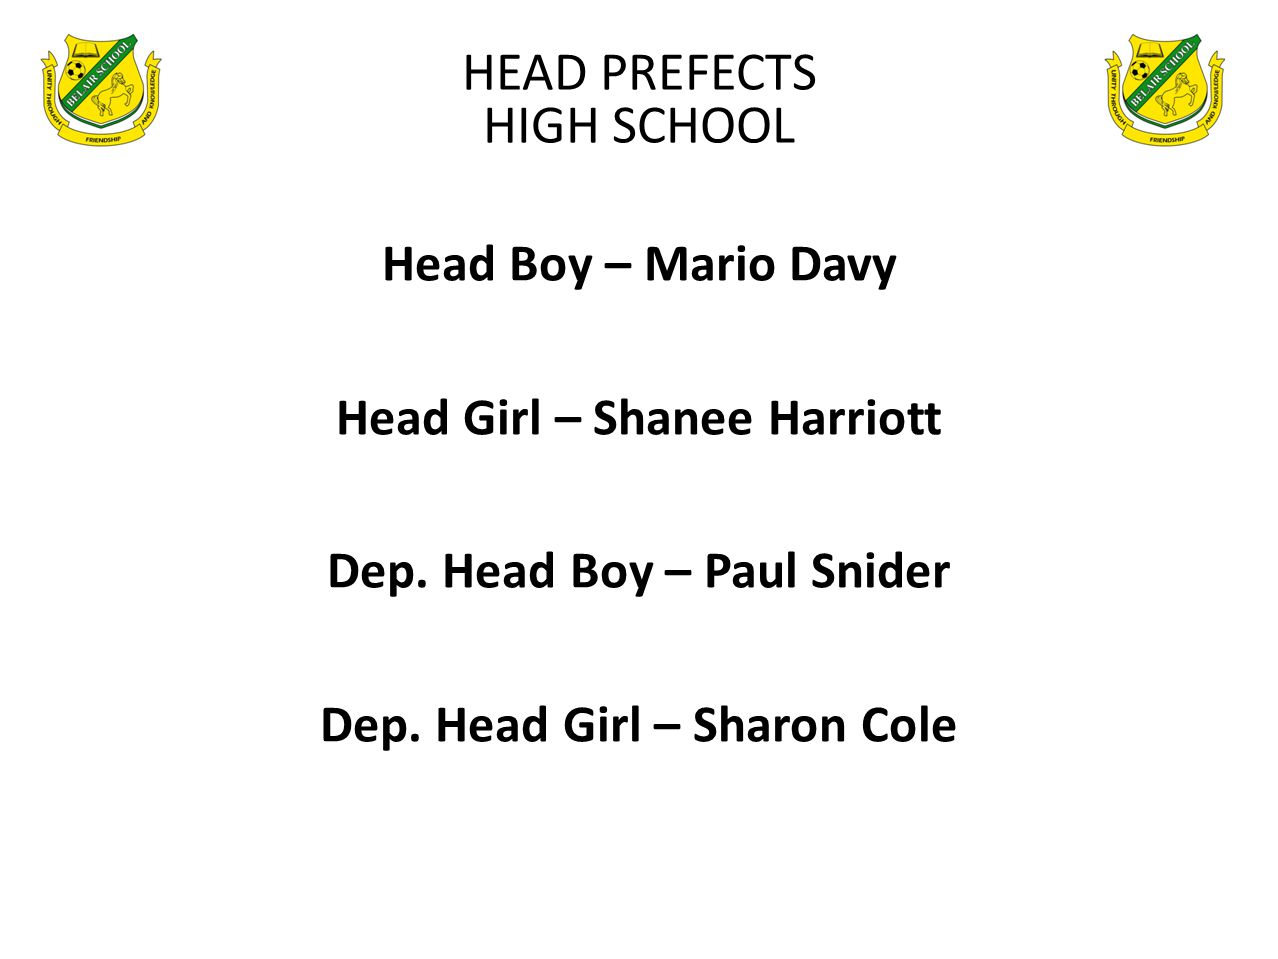 HEAD PREFECTS HIGH SCHOOL